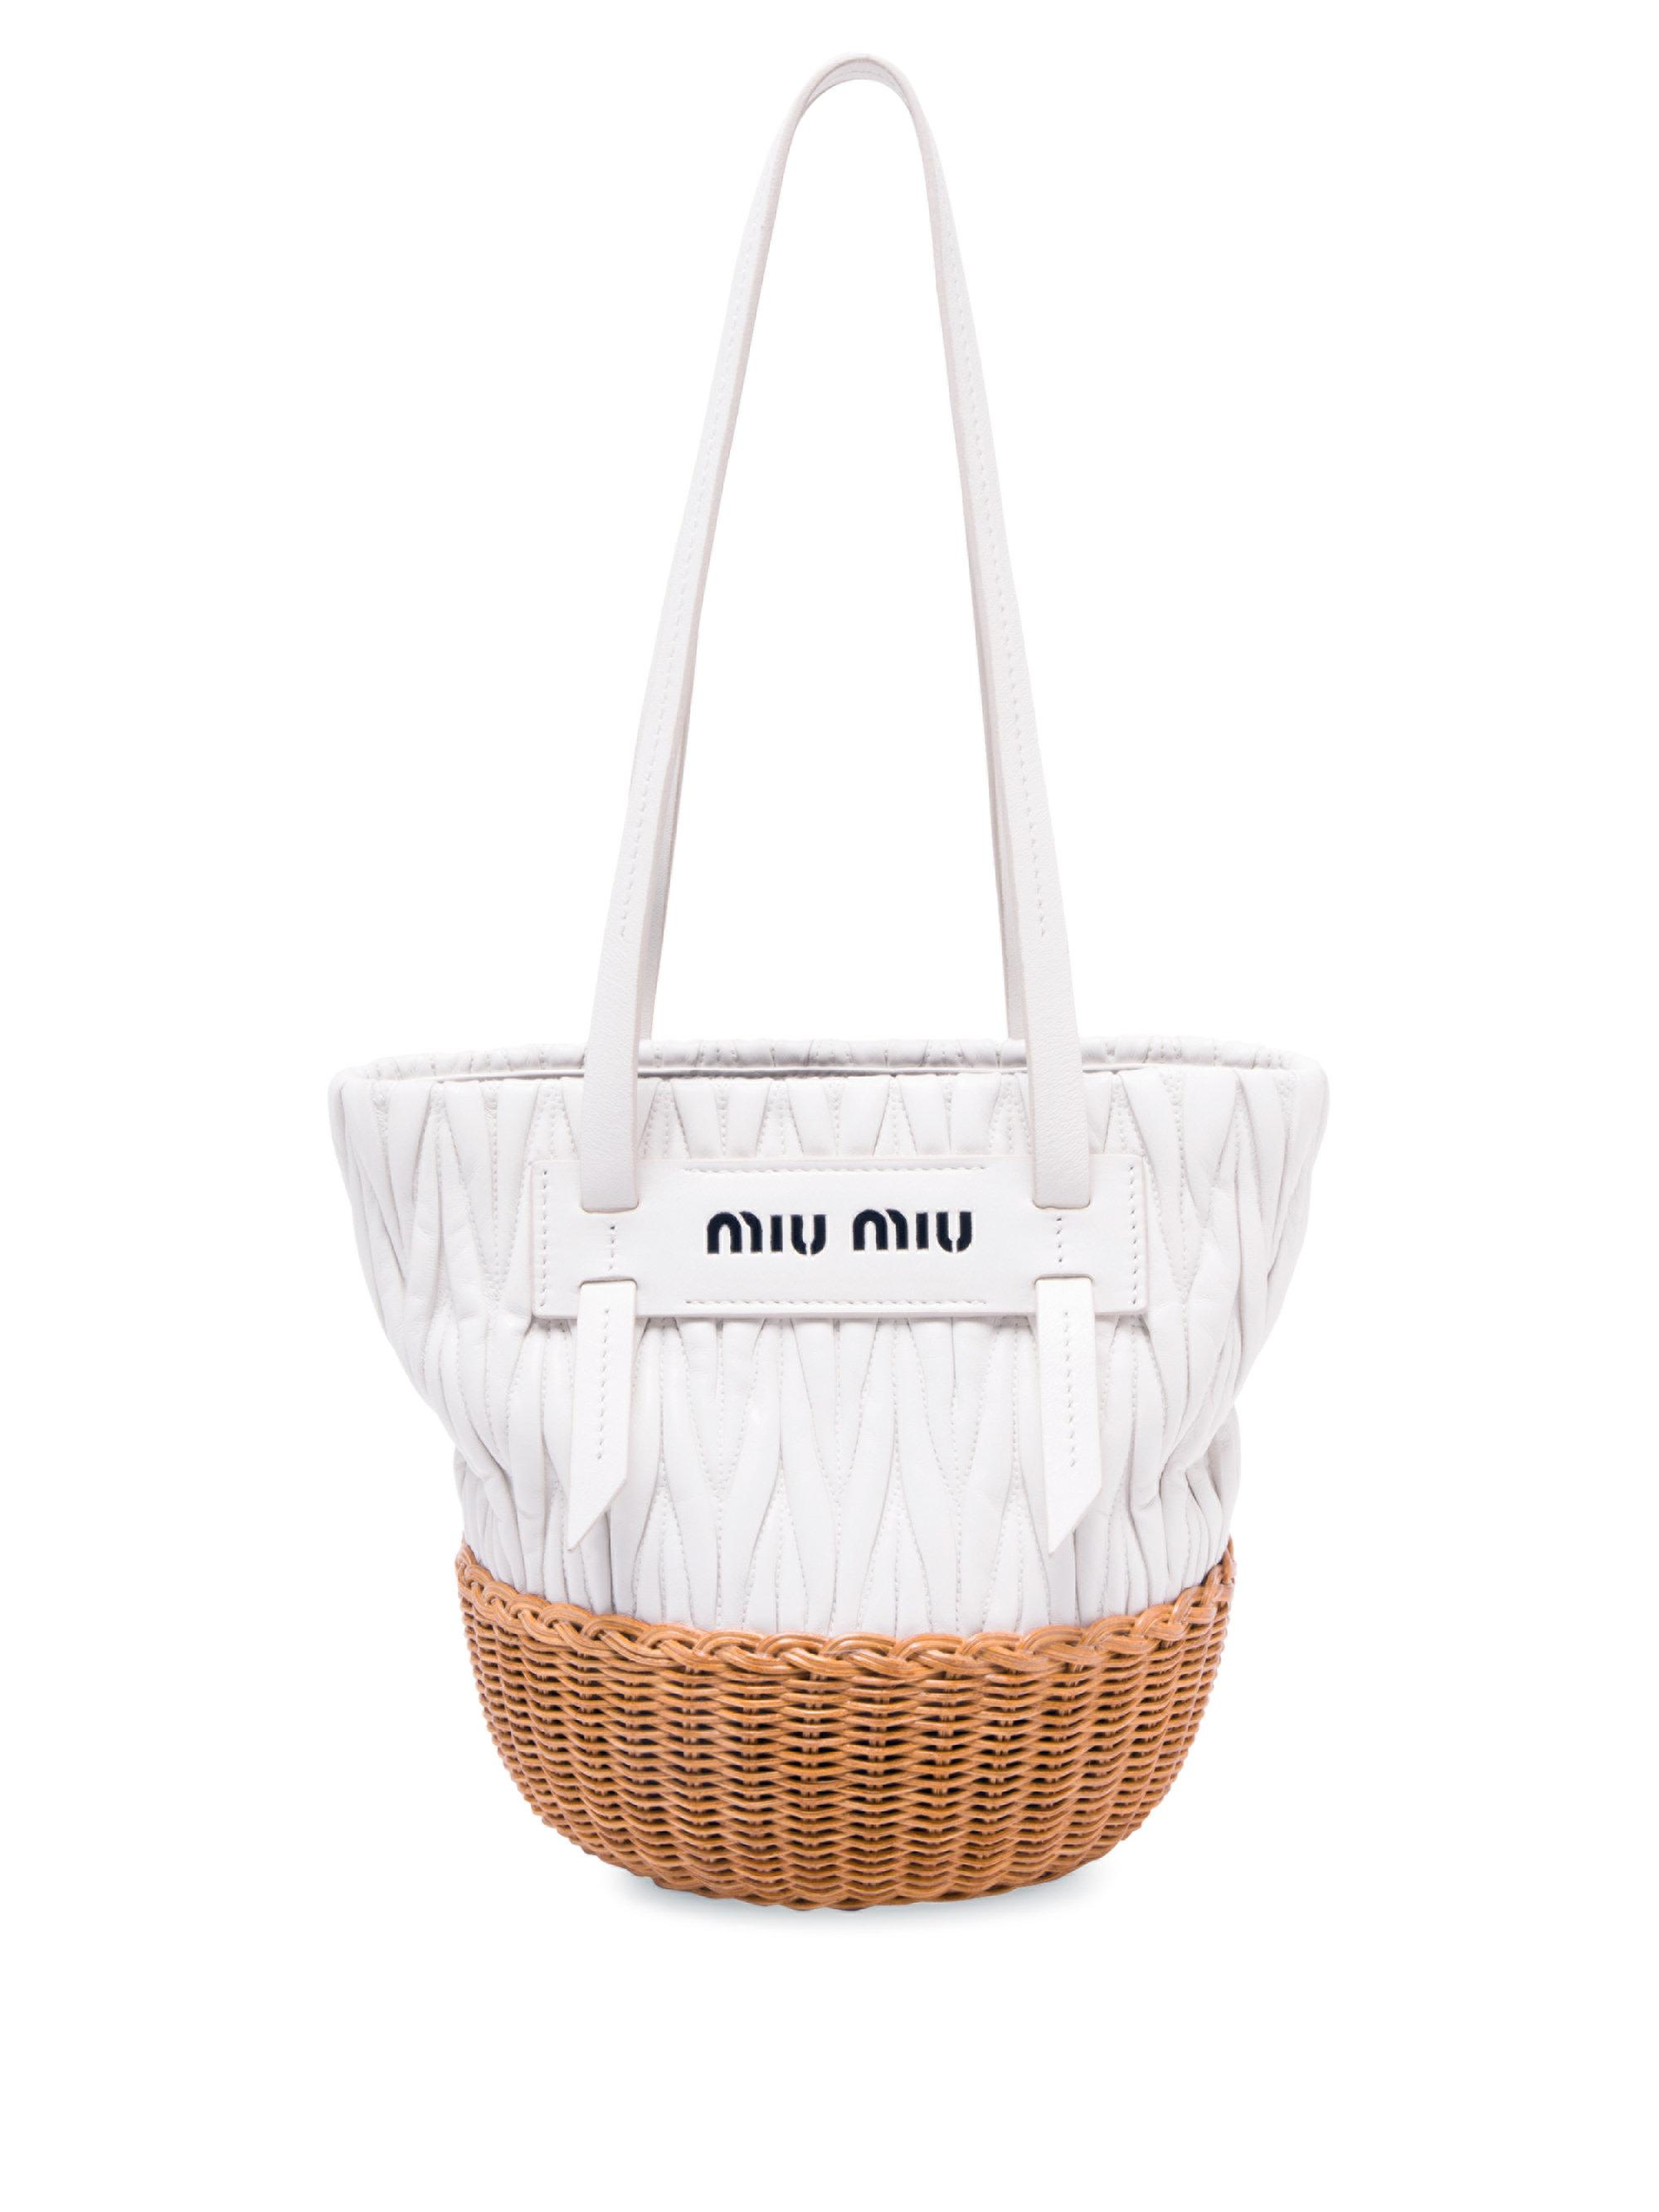 f6456583971 miu-miu-white-Textured-Leather-Basket-Bag.jpeg